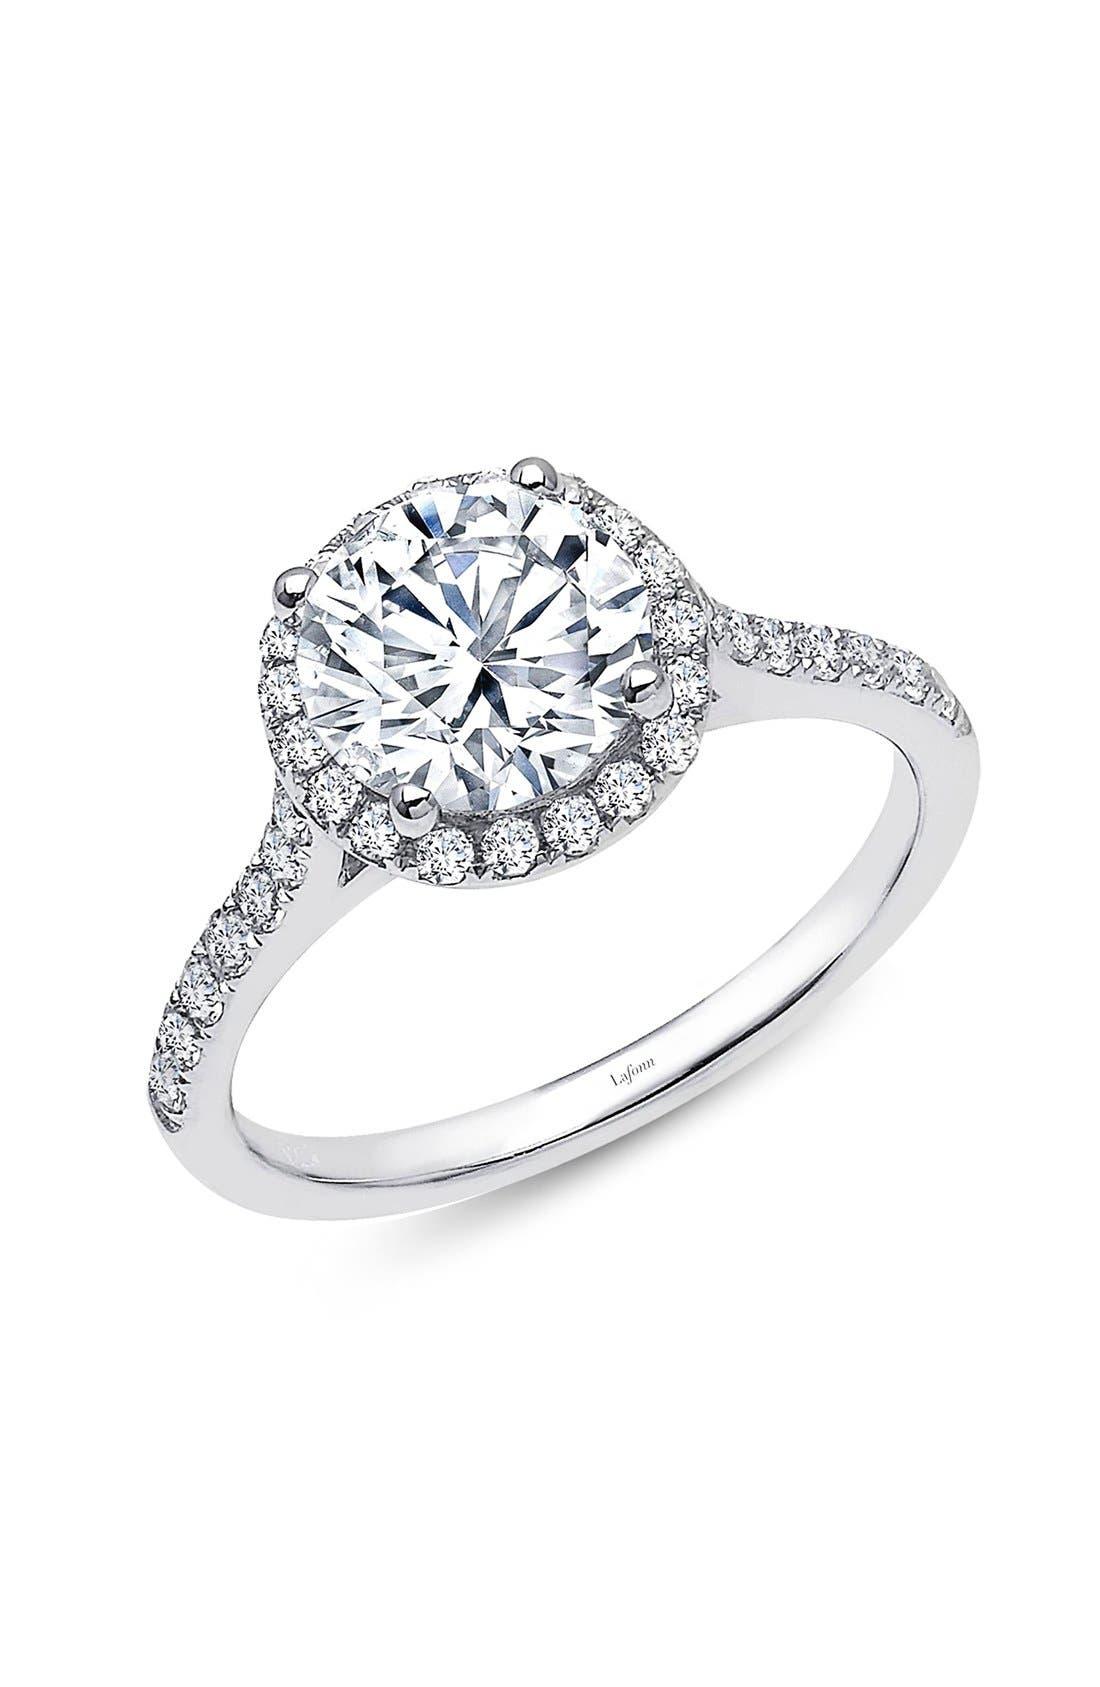 'Lassaire' Round Halo Ring,                         Main,                         color, Silver